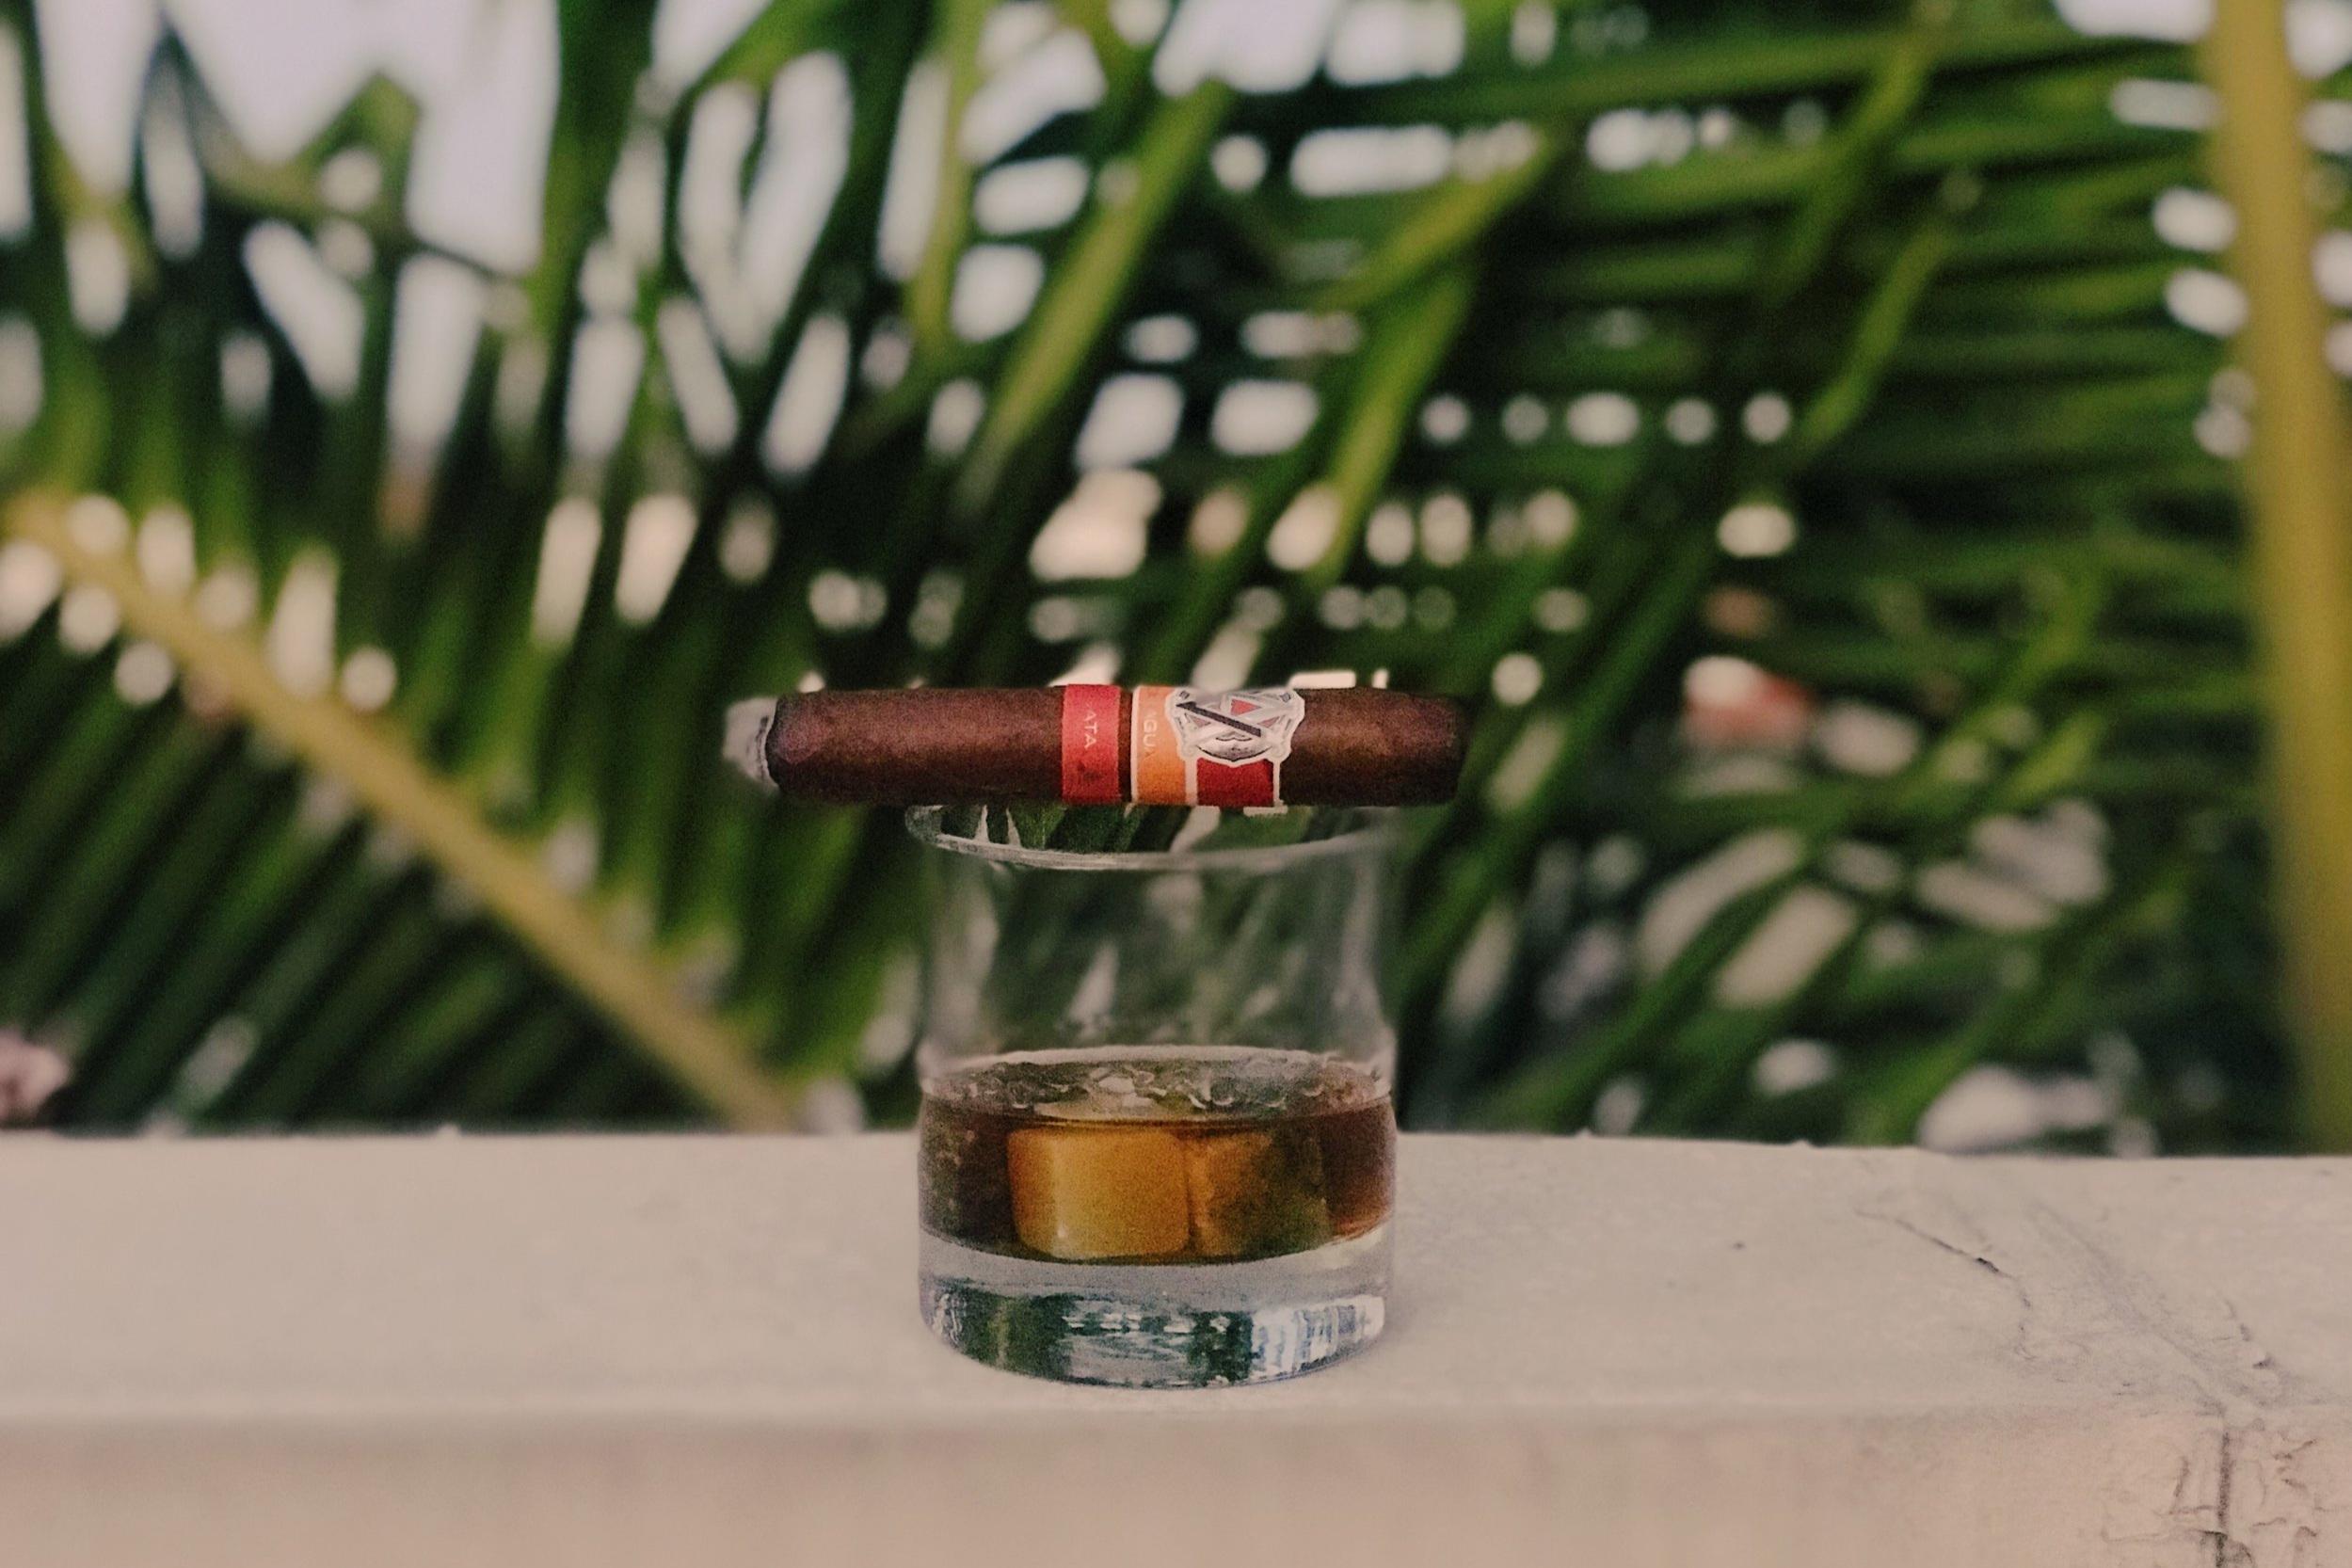 Cuban rum and cigars make great souvenirs!